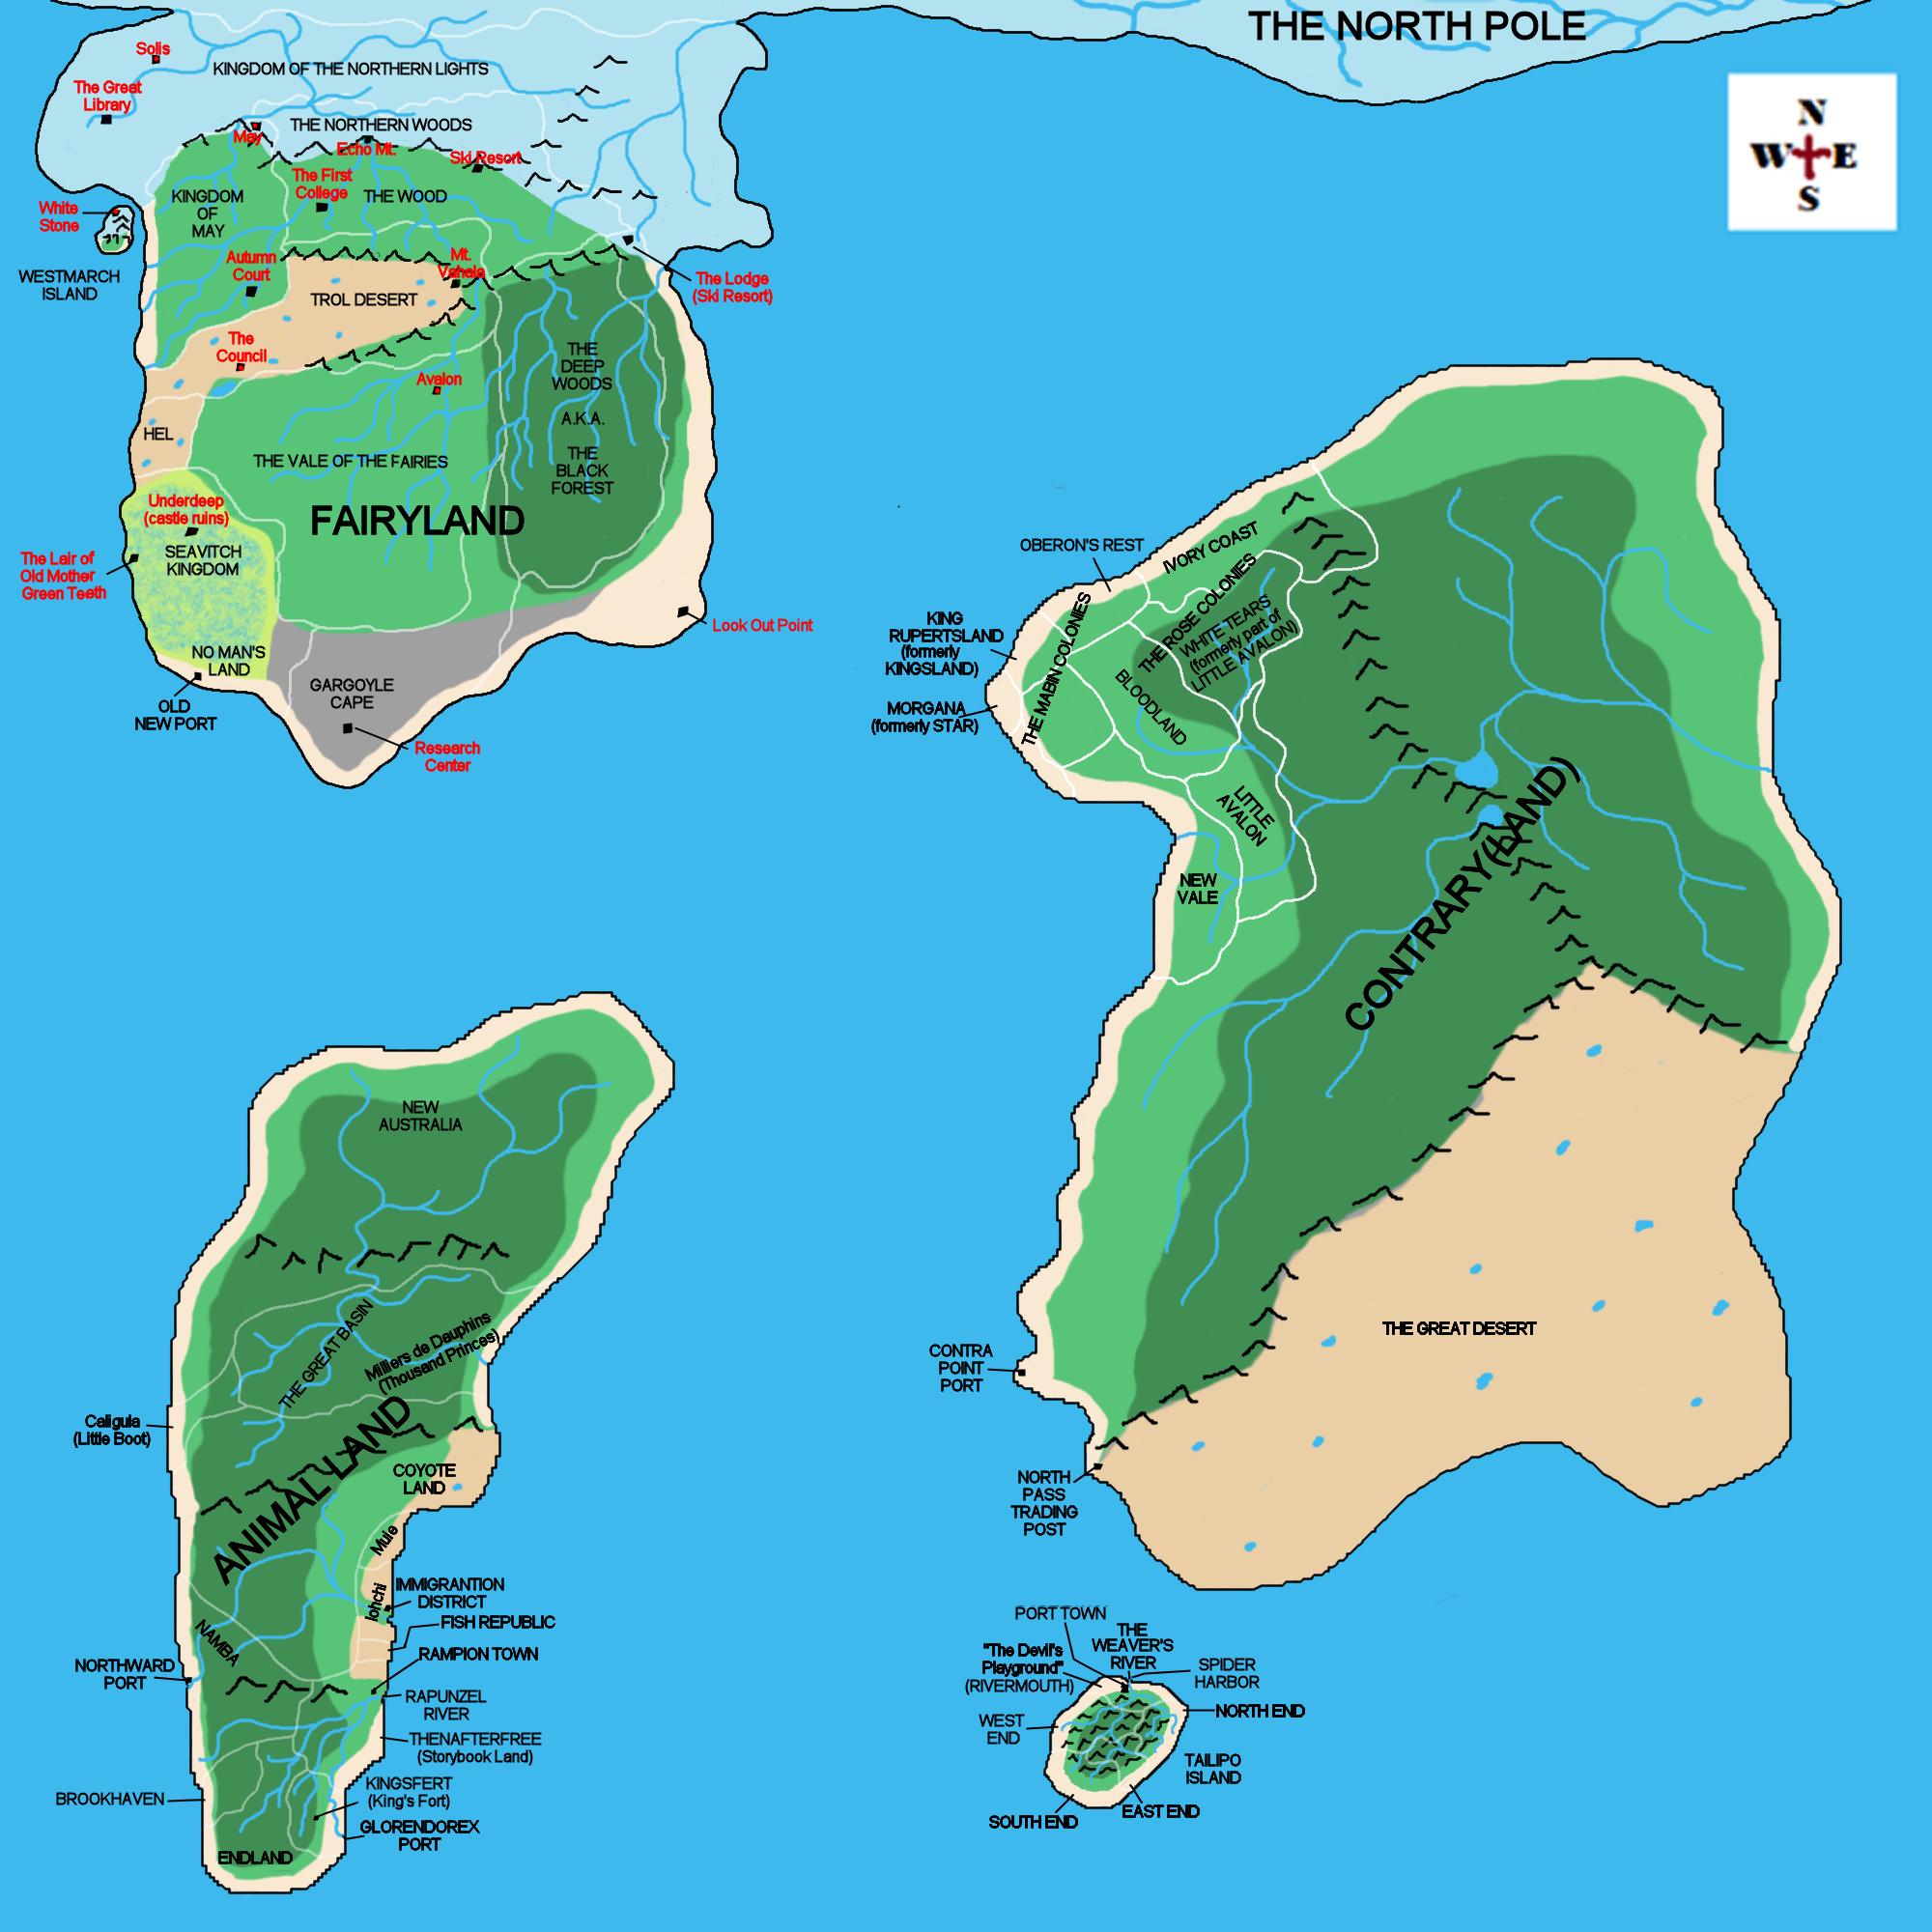 Fairyland world map by ms draca on deviantart fairyland world map by ms draca gumiabroncs Images